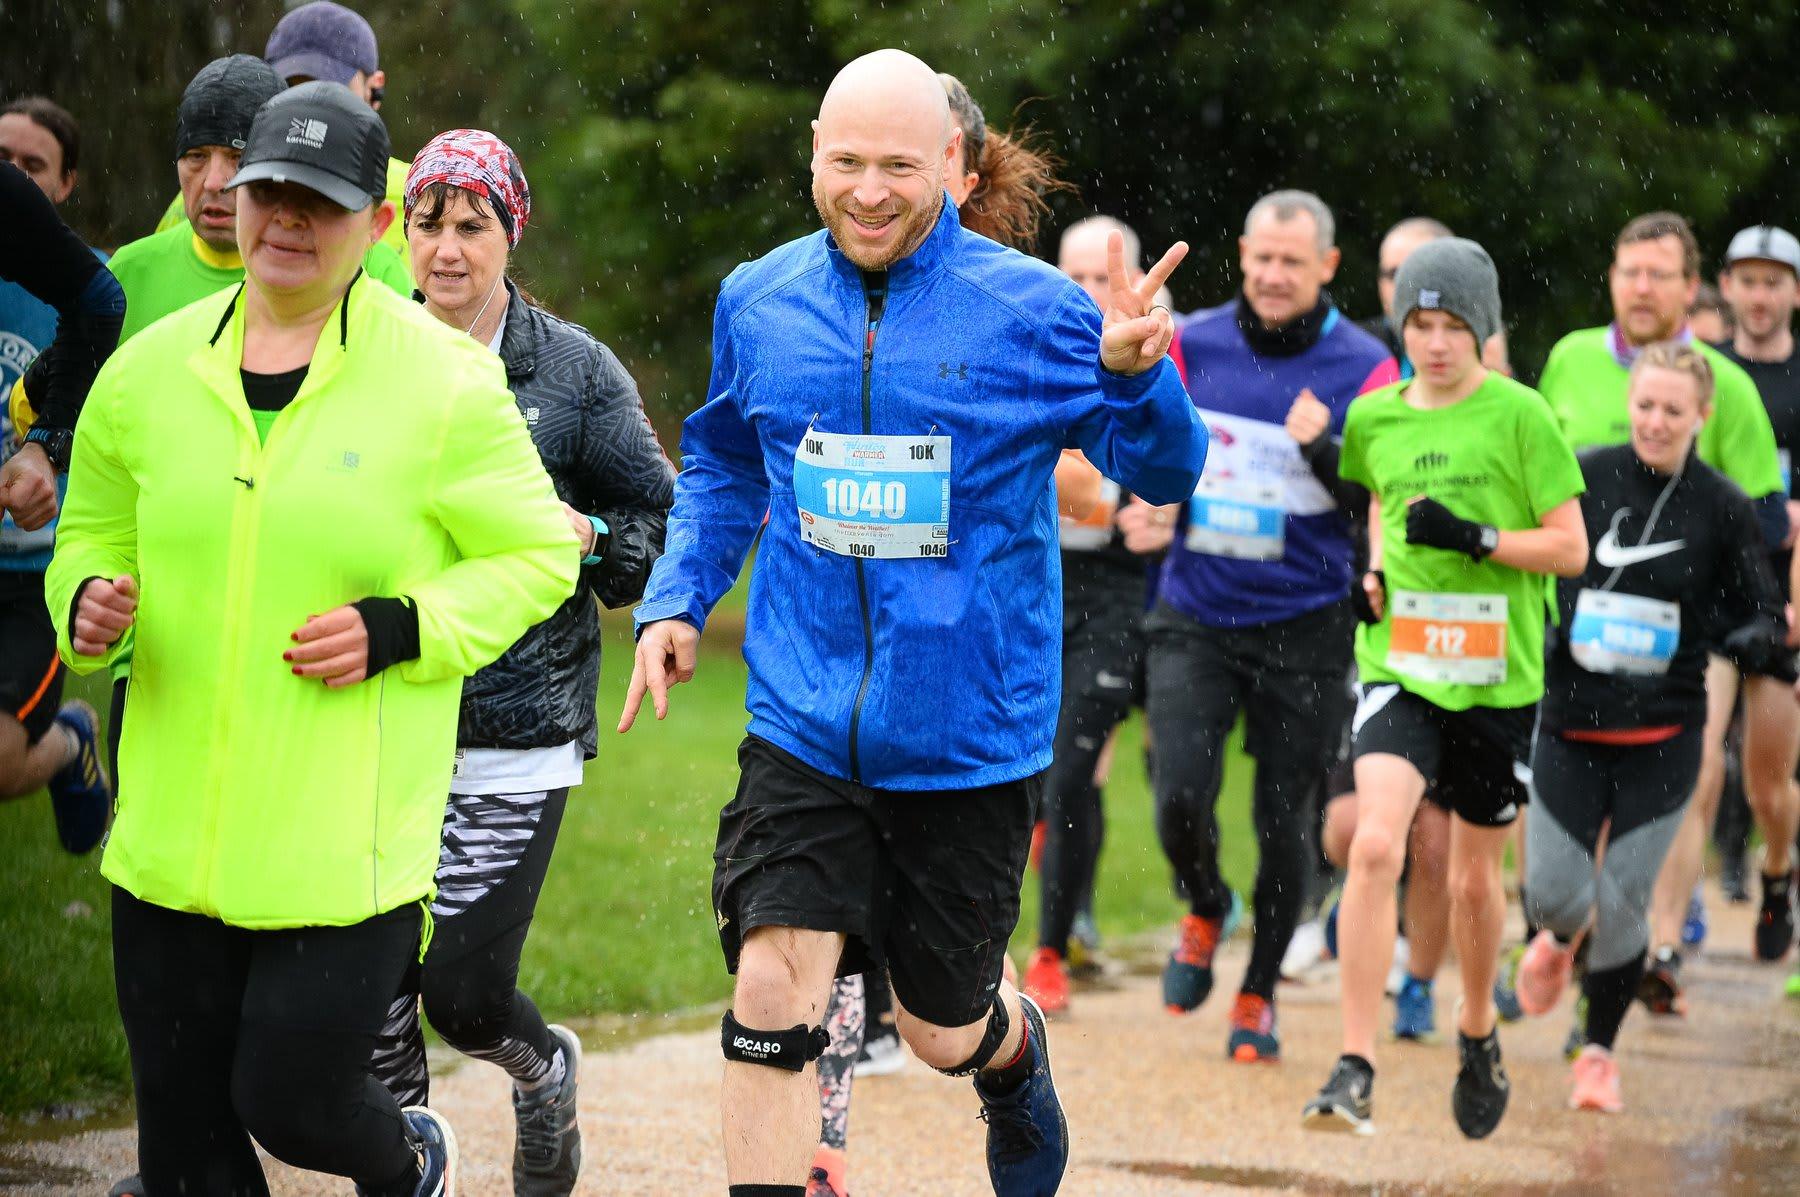 The Milton Keynes 5k and 10k Winter Warmer Run